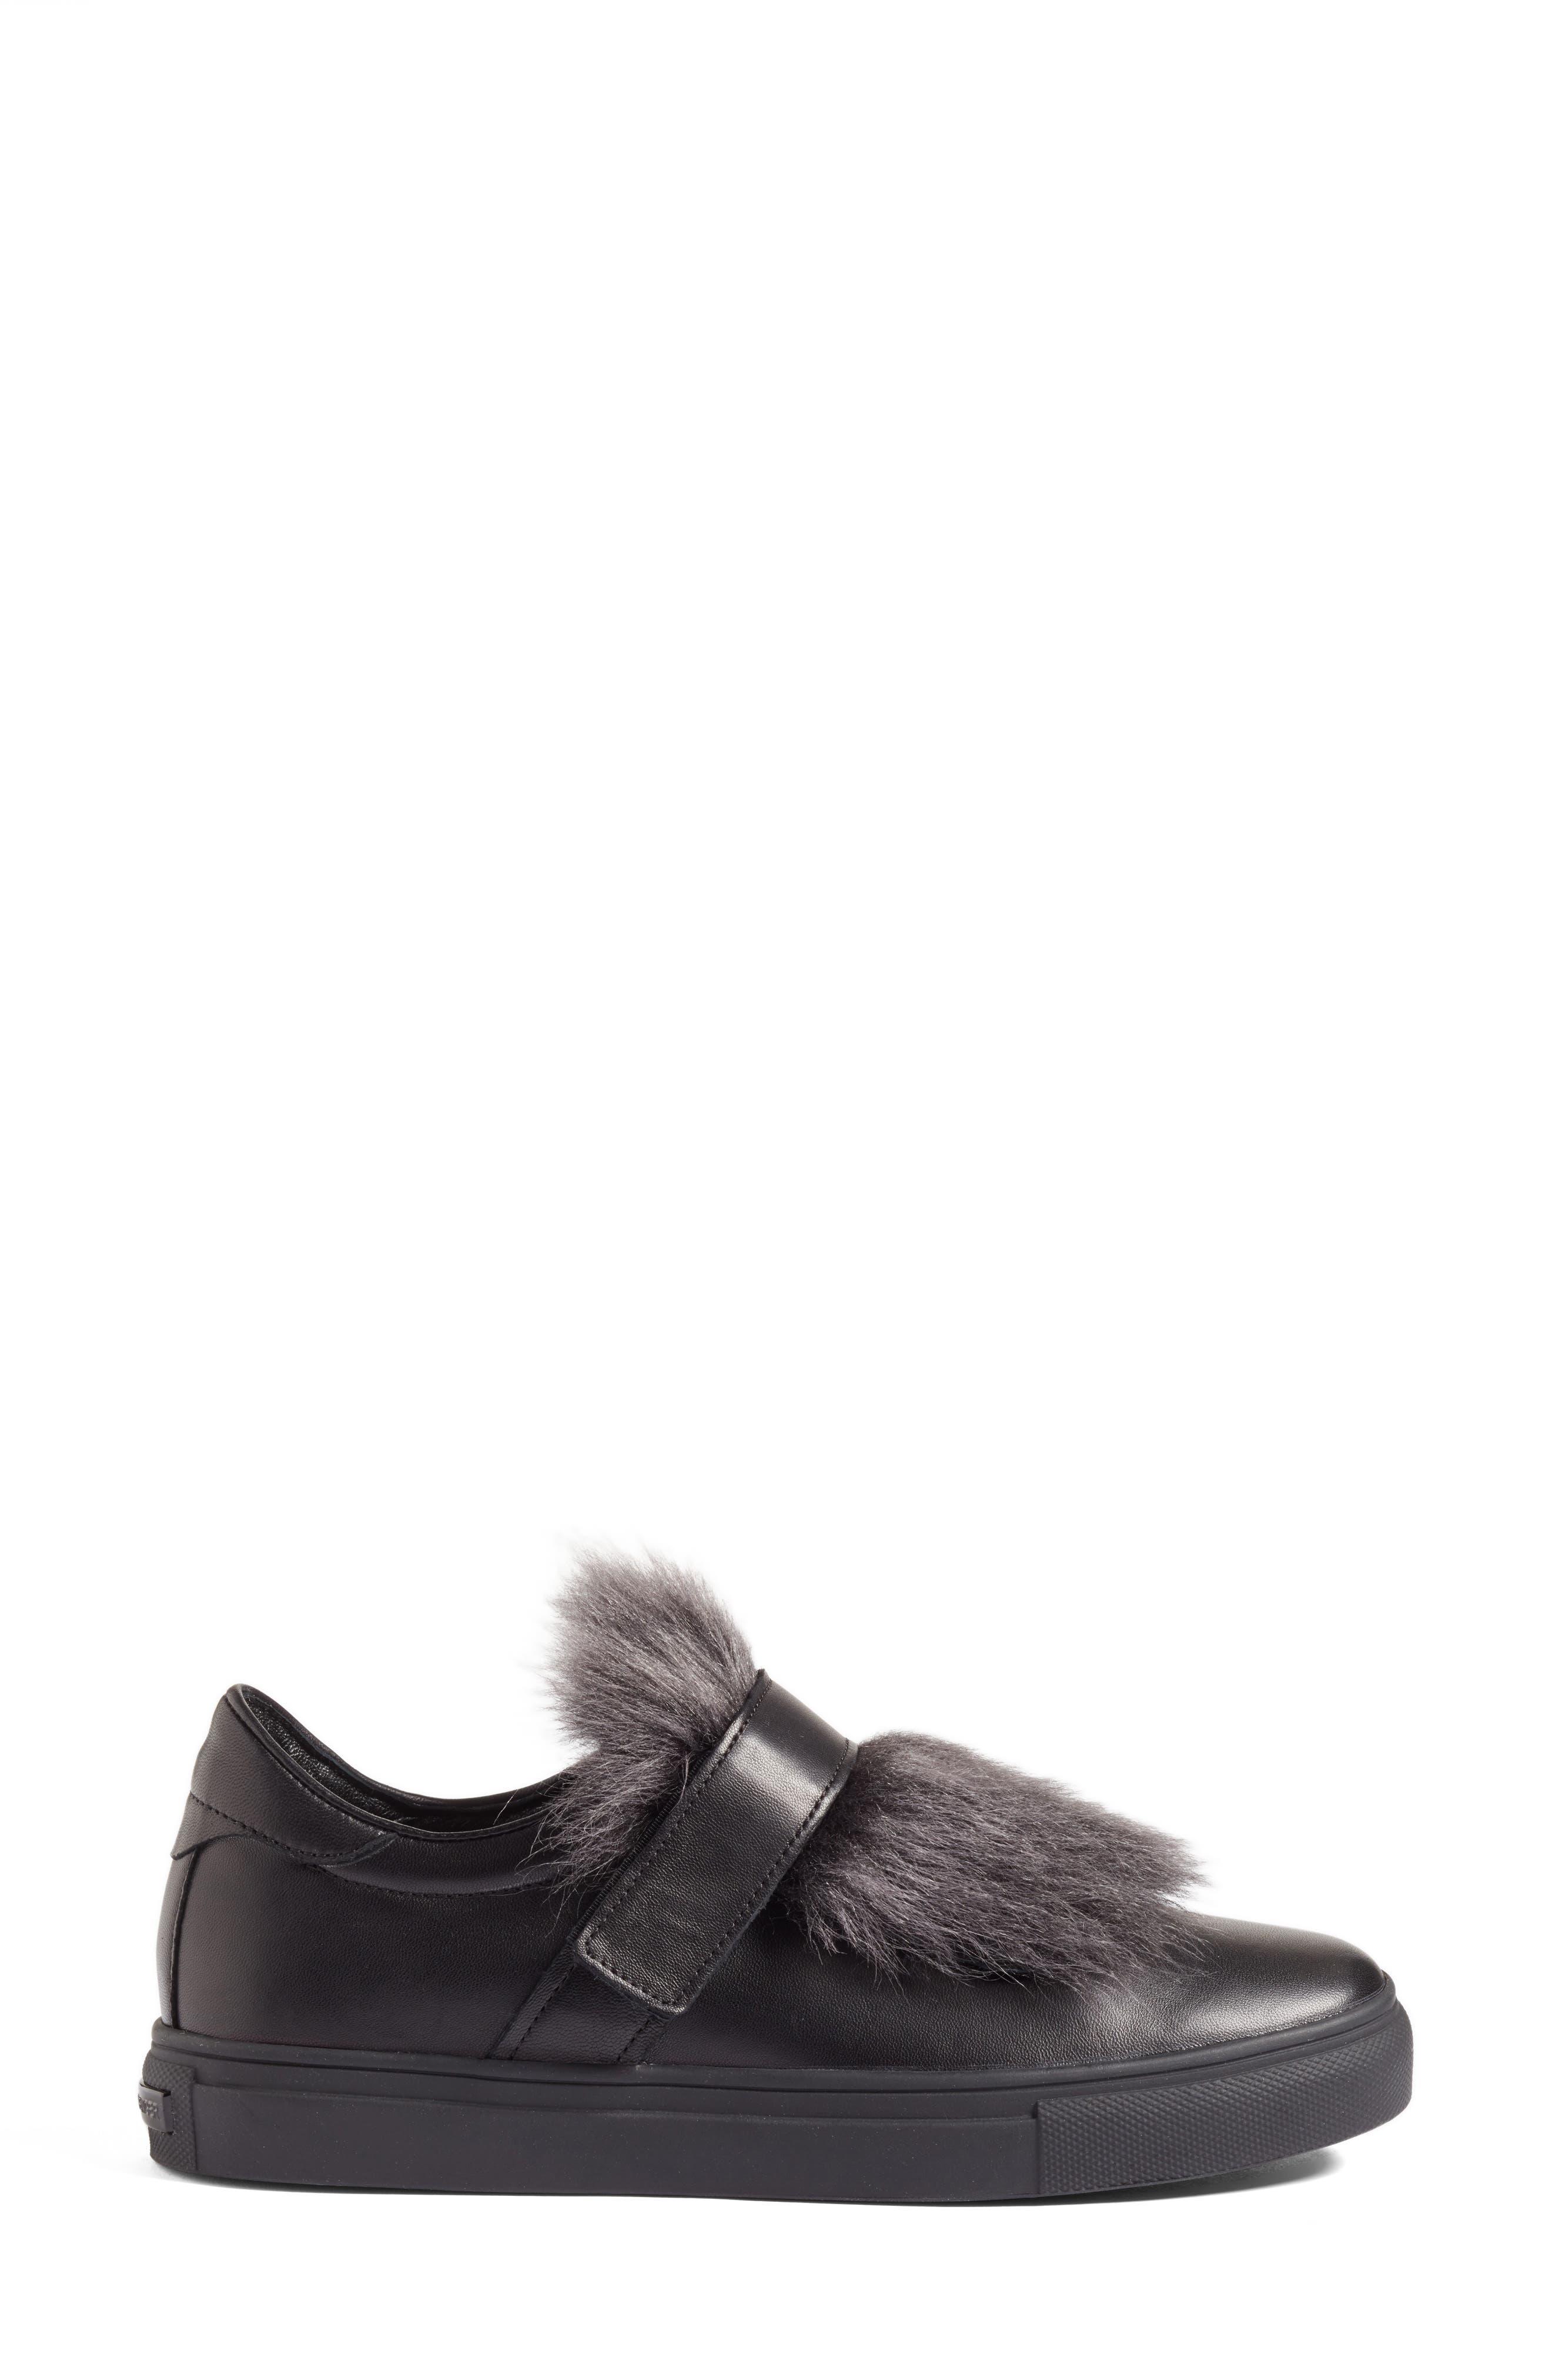 Kennel & Schmenger Basket Slip-On Sneaker with Genuine Shearling Trim,                             Alternate thumbnail 3, color,                             Black